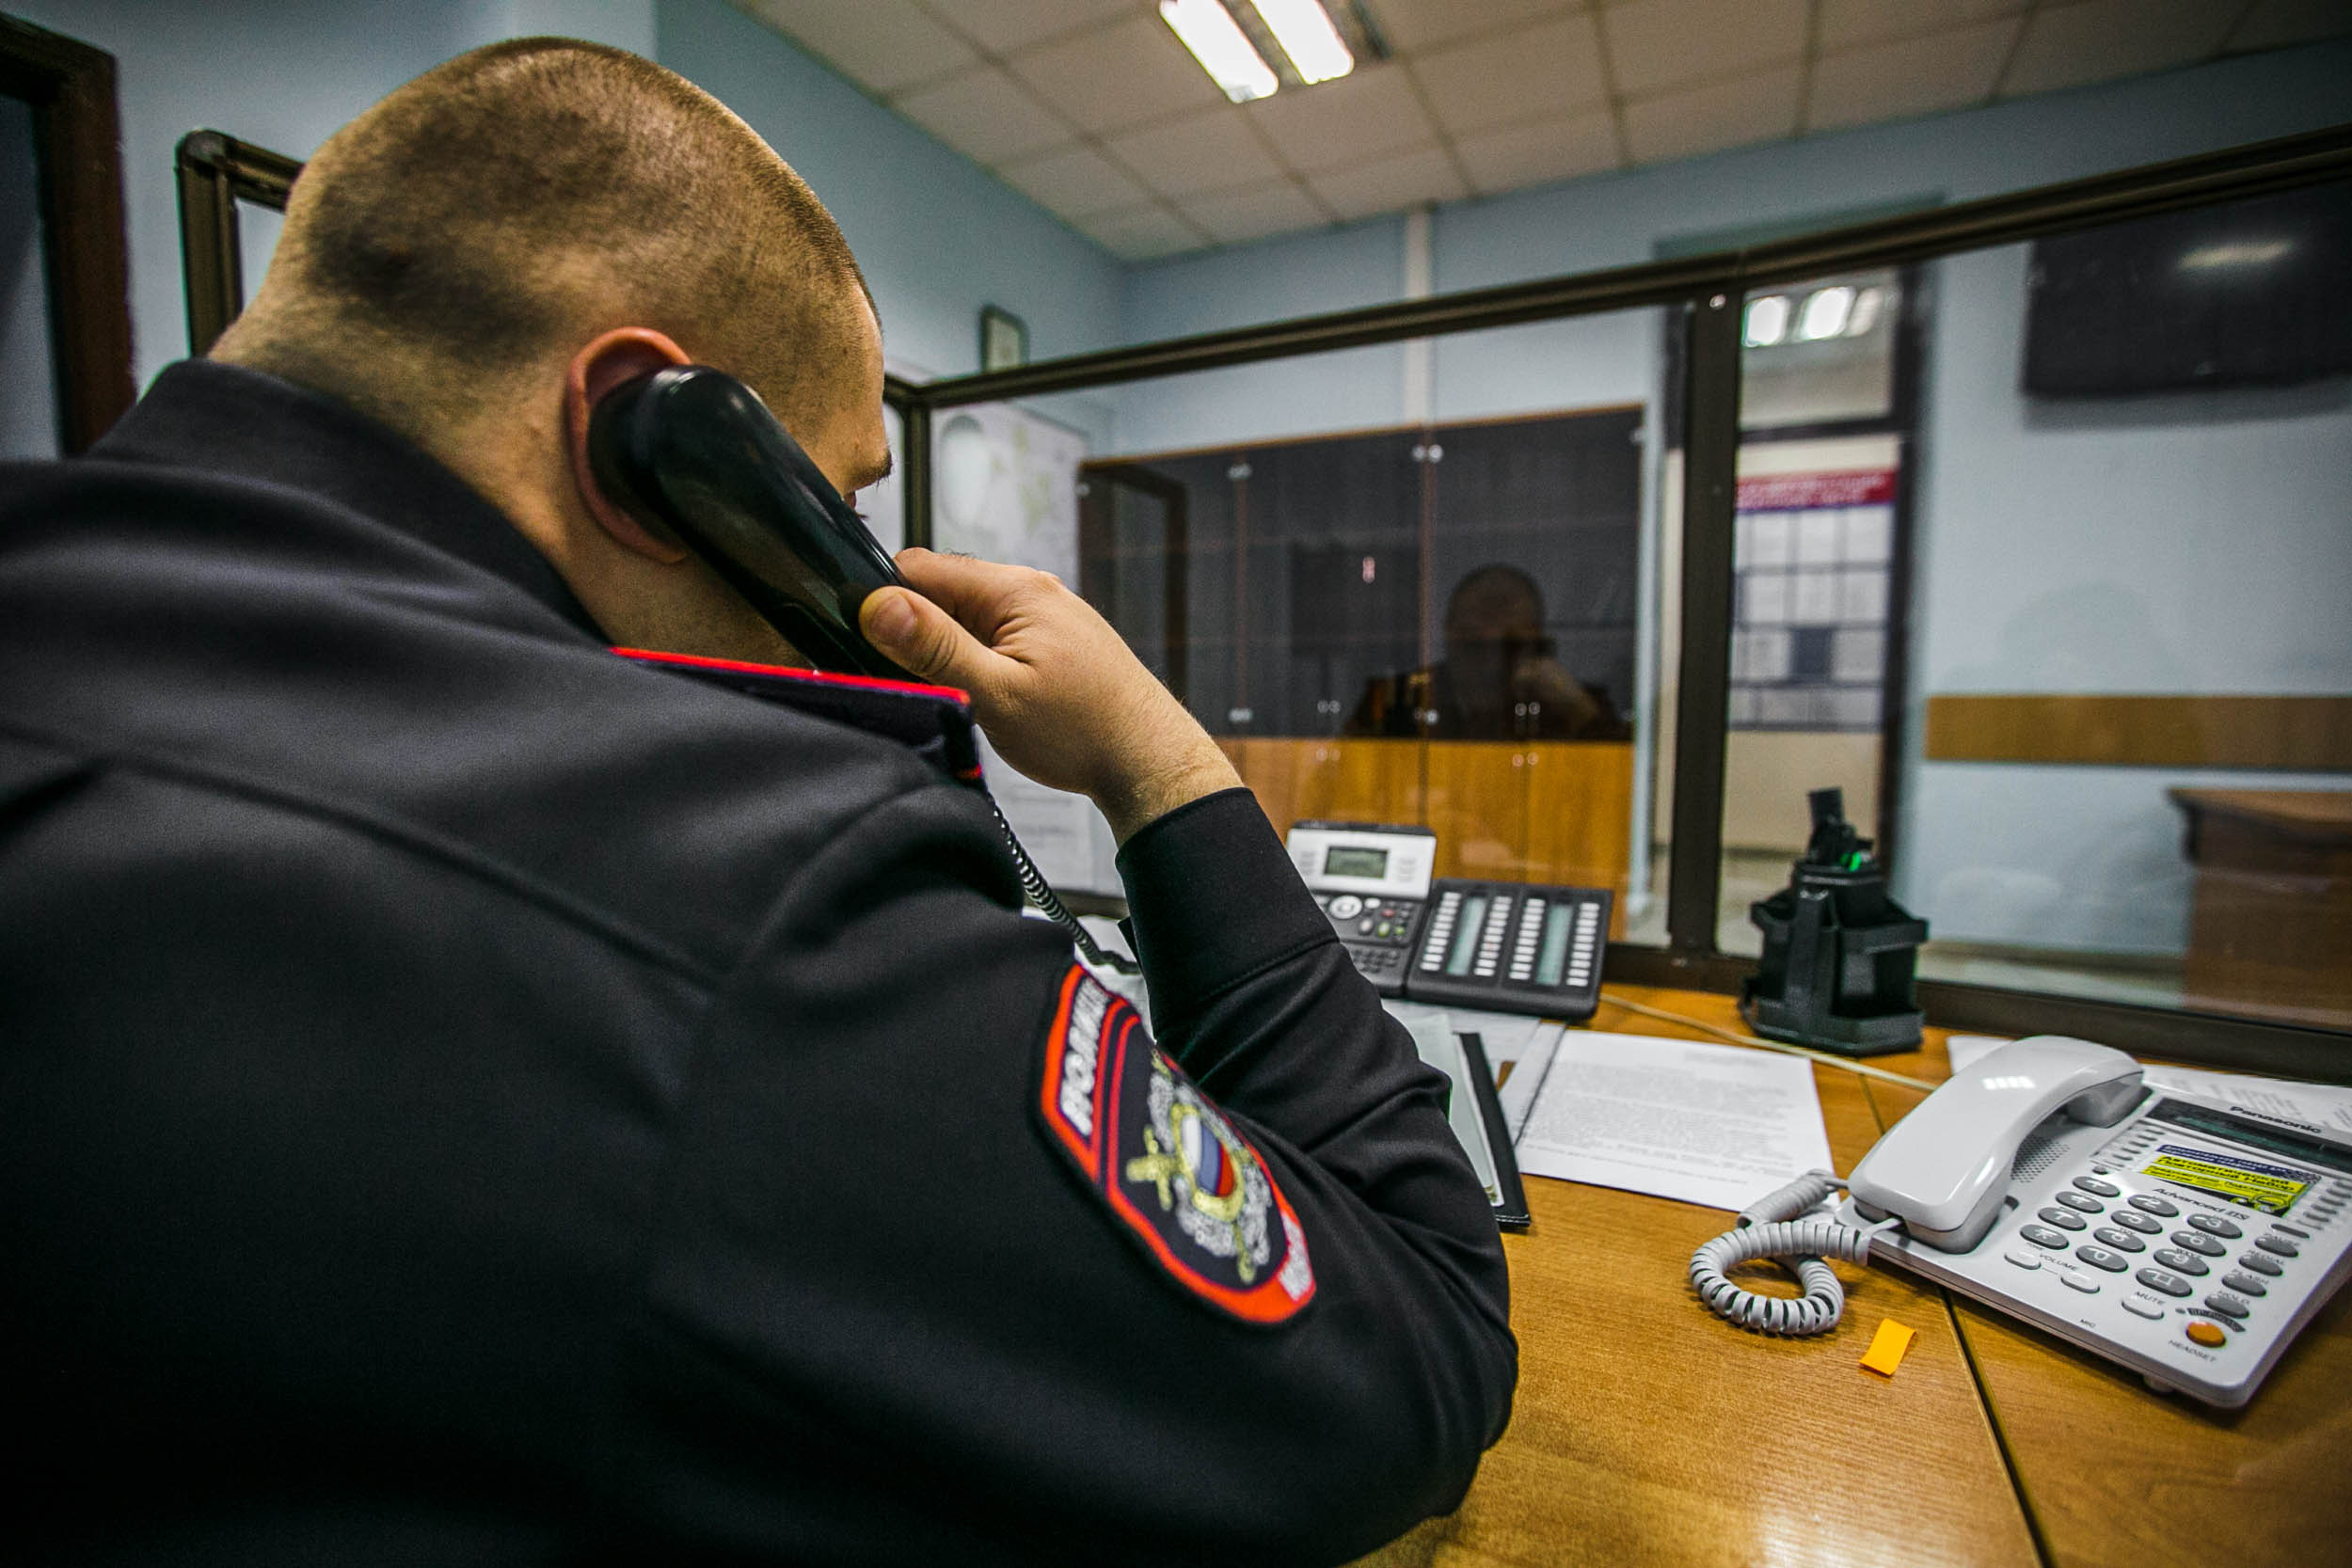 https://www.openpolice.ru/media/images/news/sboj-pervichnogo-filtra/167483.jpg